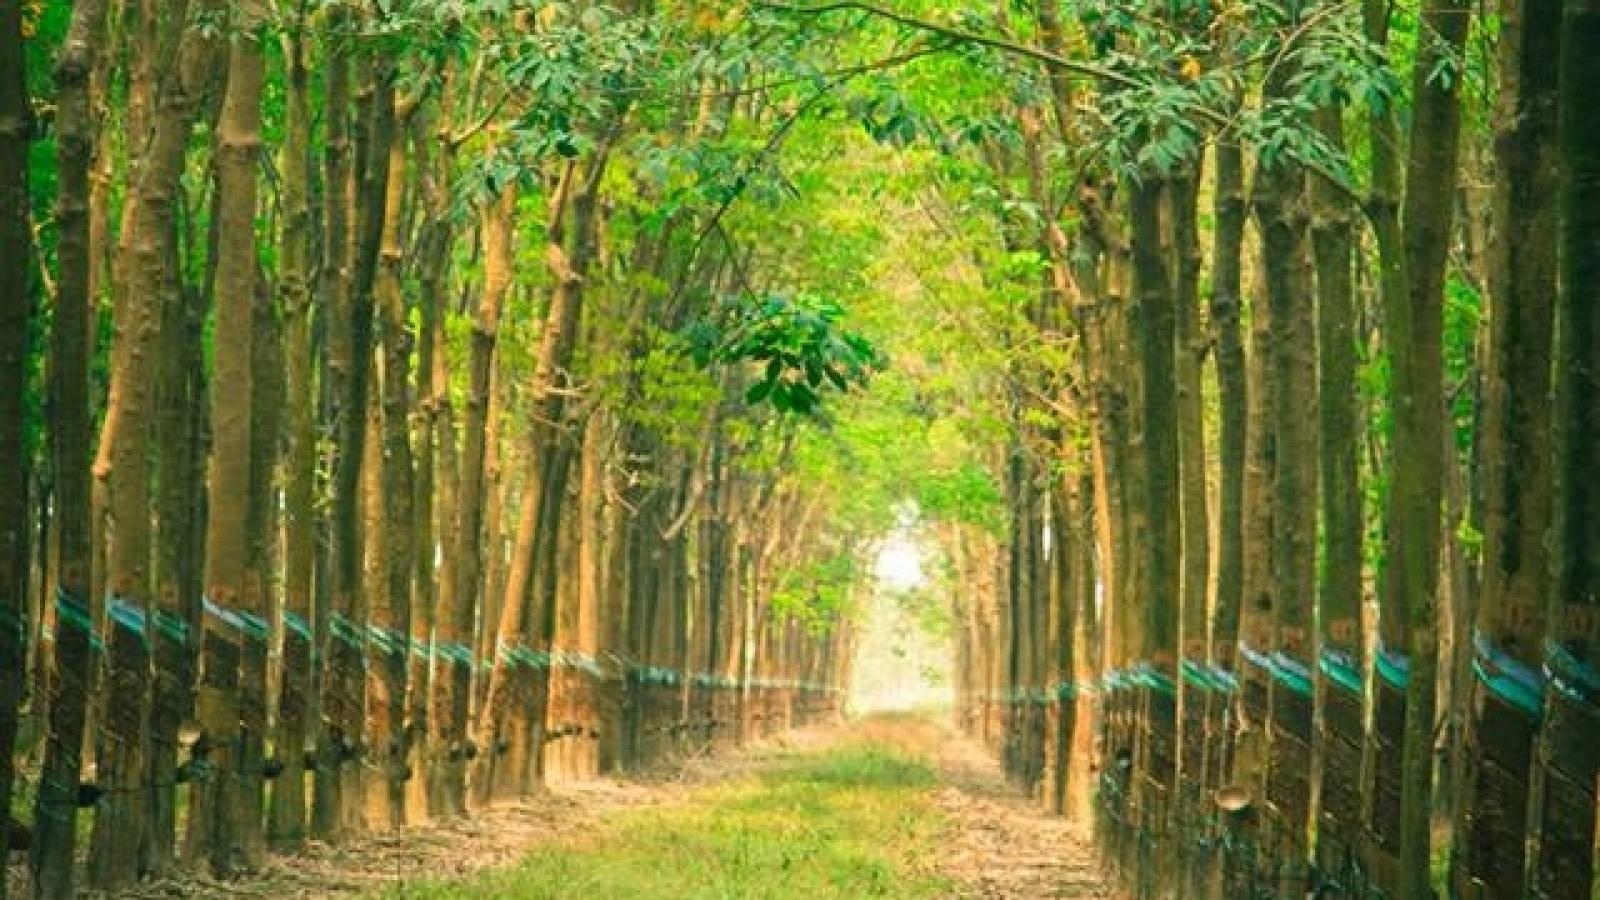 Campuchia thu gần 100 triệu USD từ xuất khẩu cao su bất chấp Covid-19